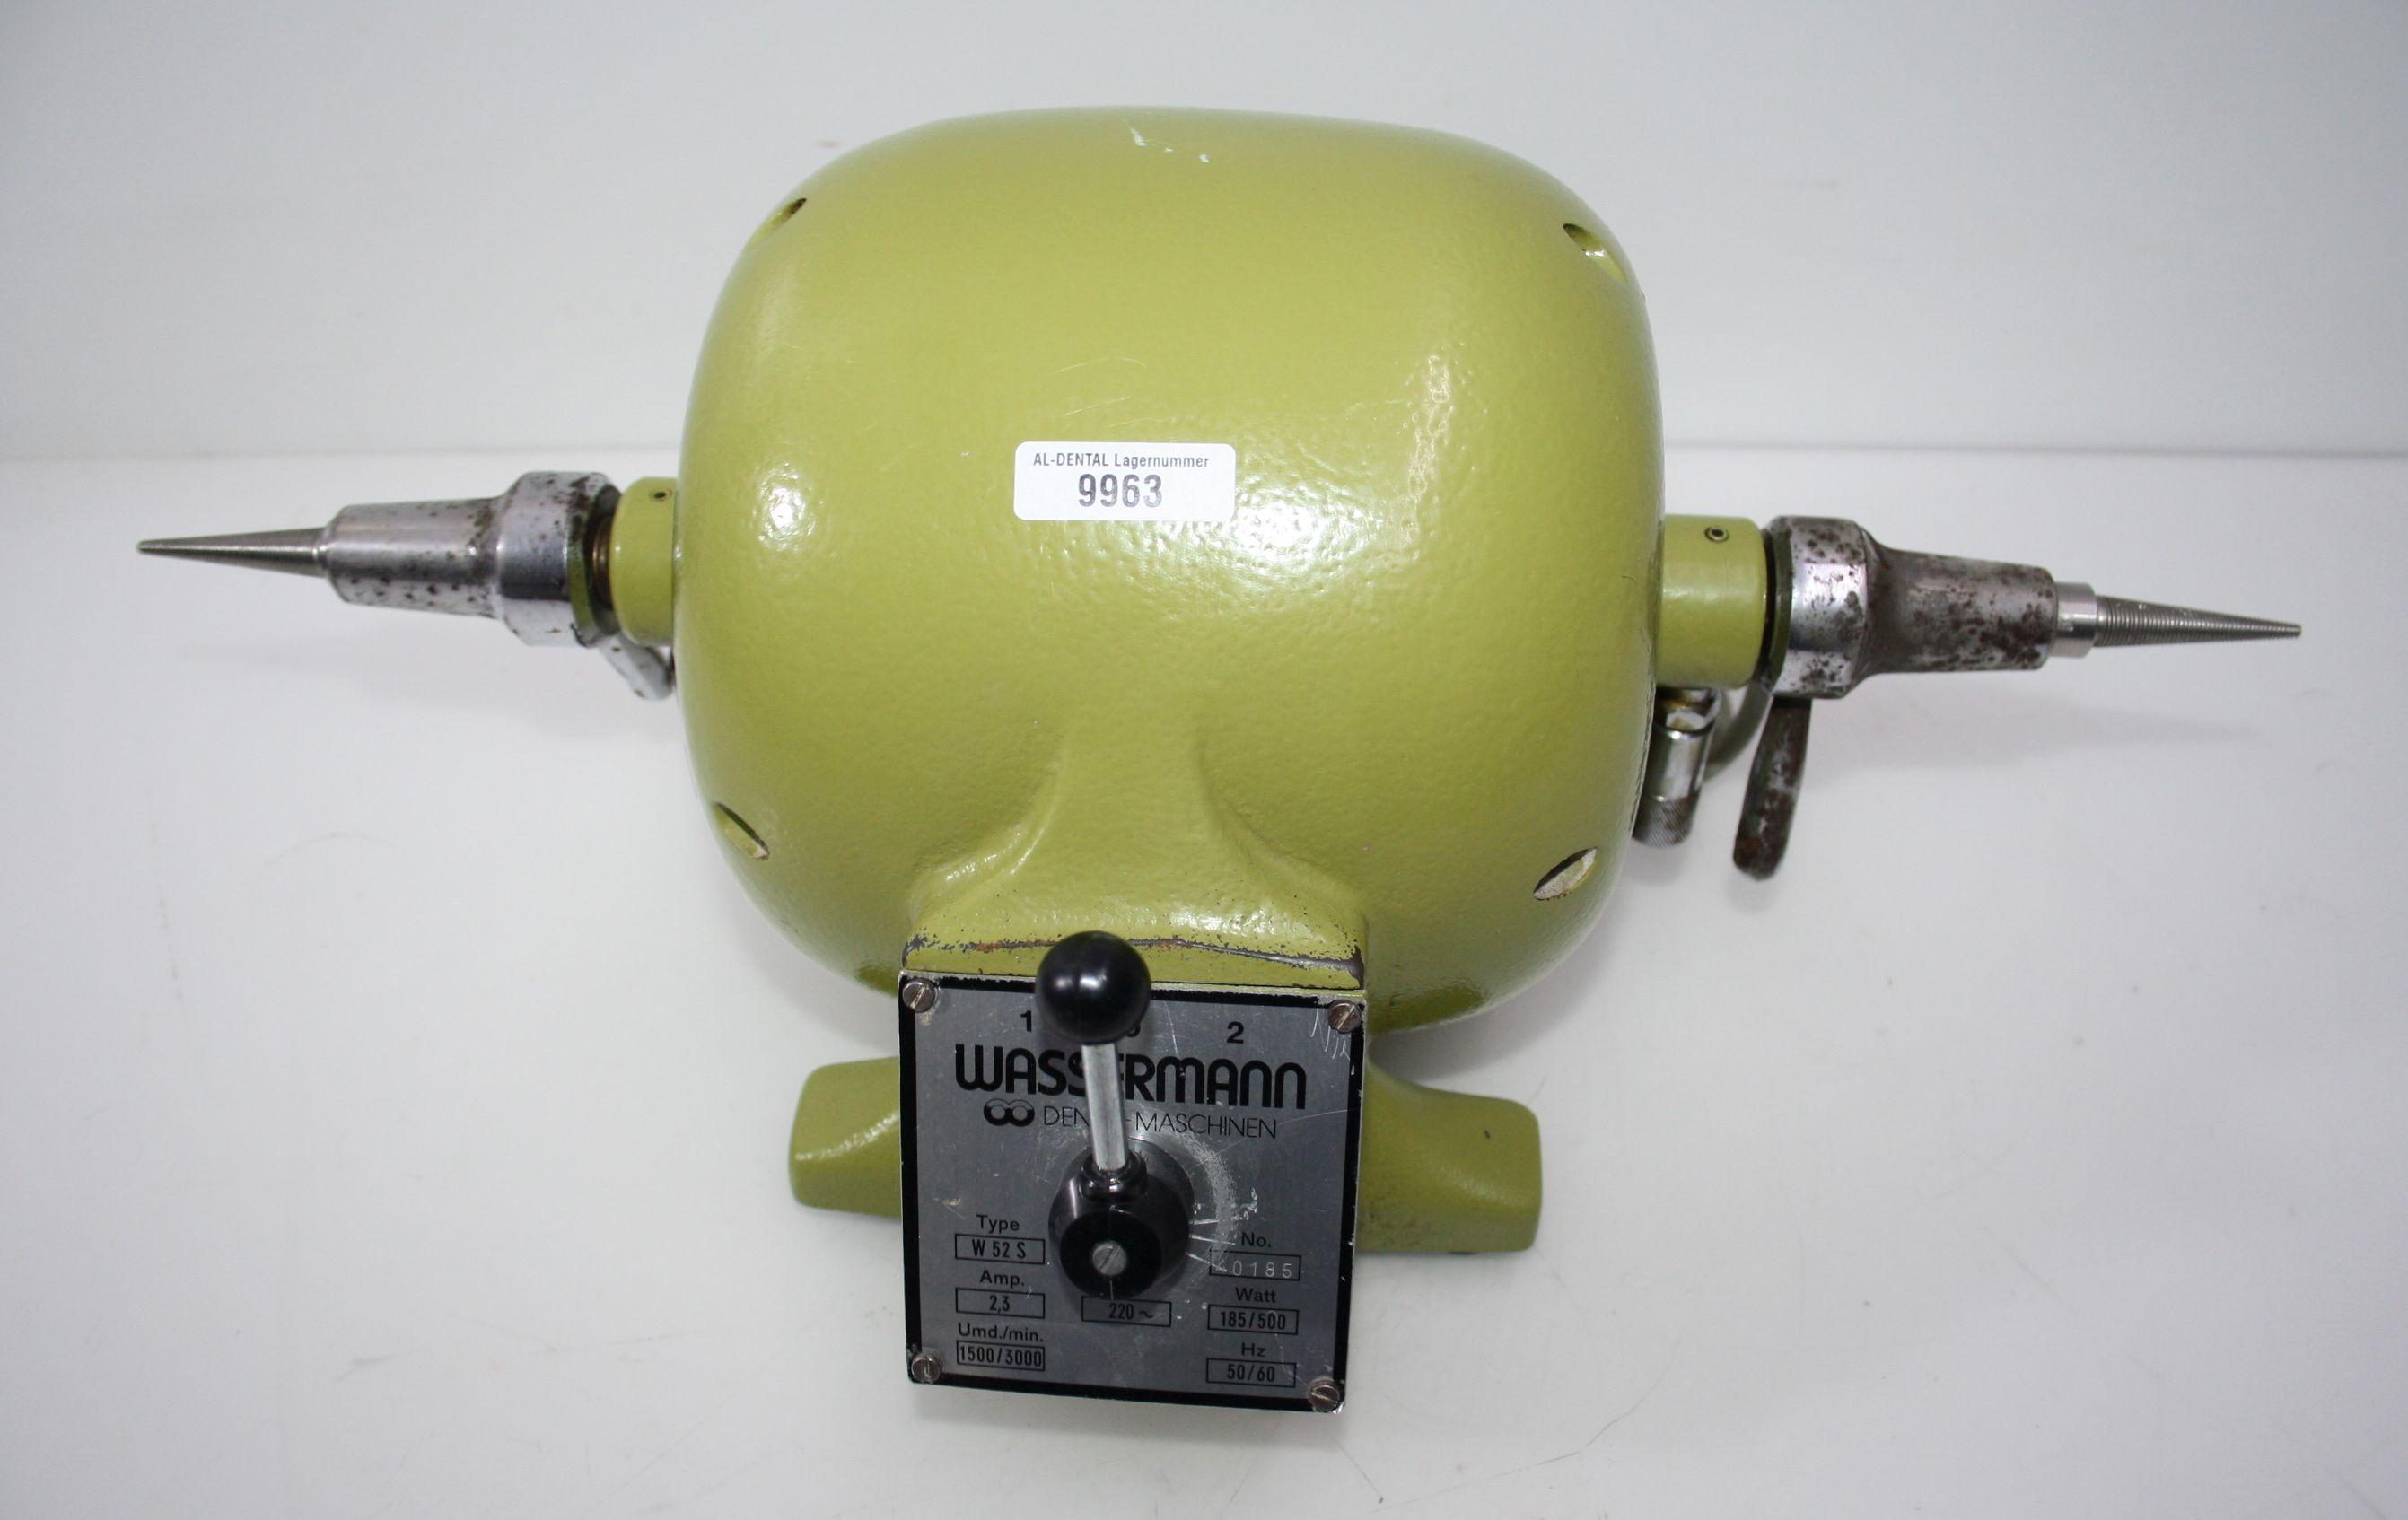 Wassermann Poliermotor Typ W 52 S # 9963